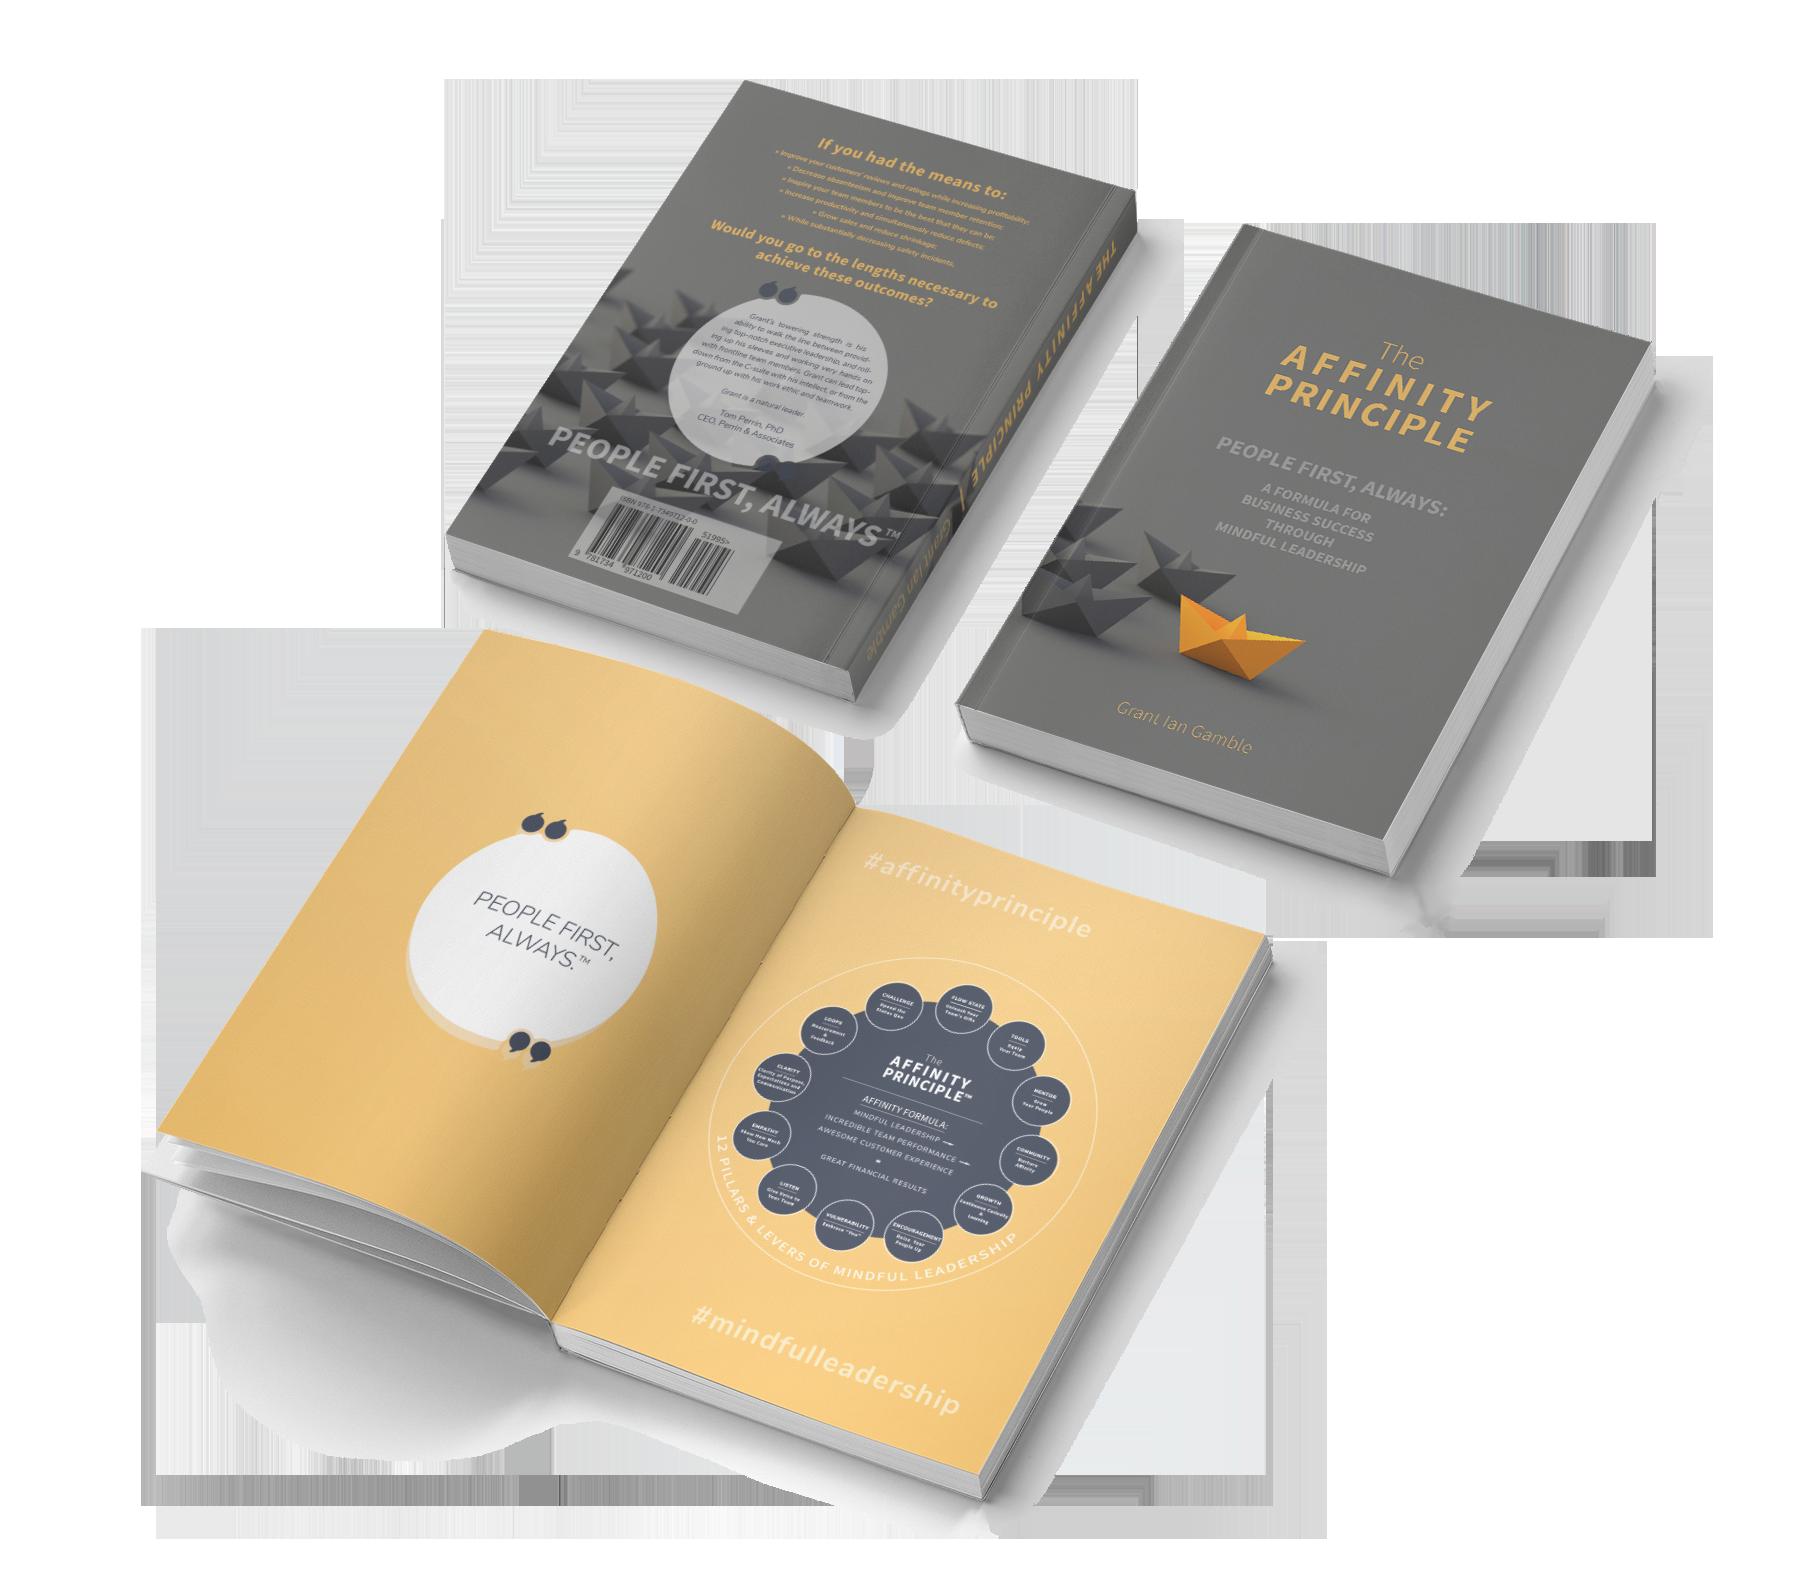 The Affinity Principle   Business Mindful Leadership   Grant Ian Gamble